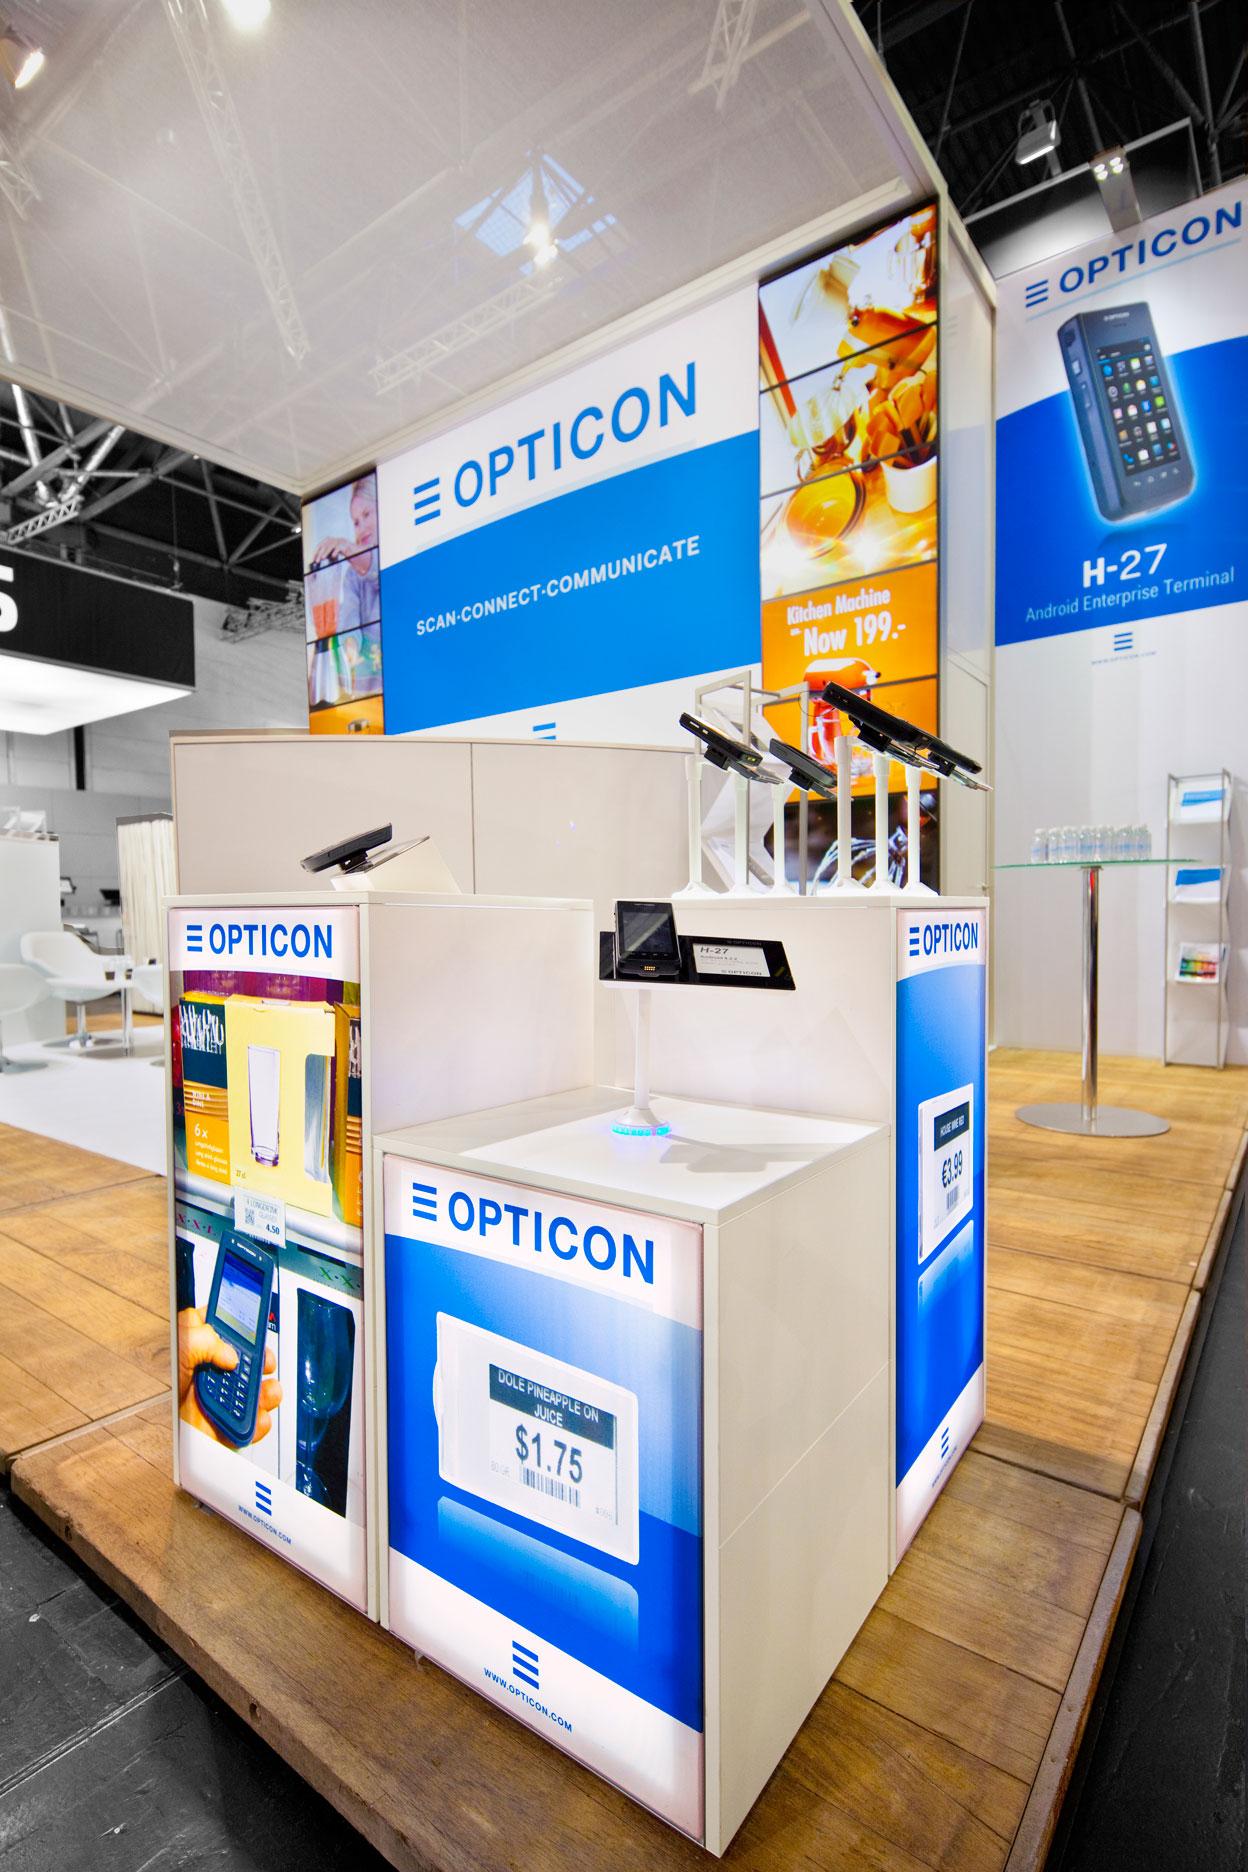 Buck-Design---Opticon---EURO-Cis-2015---Standbouwfotografie-#2366+.jpg